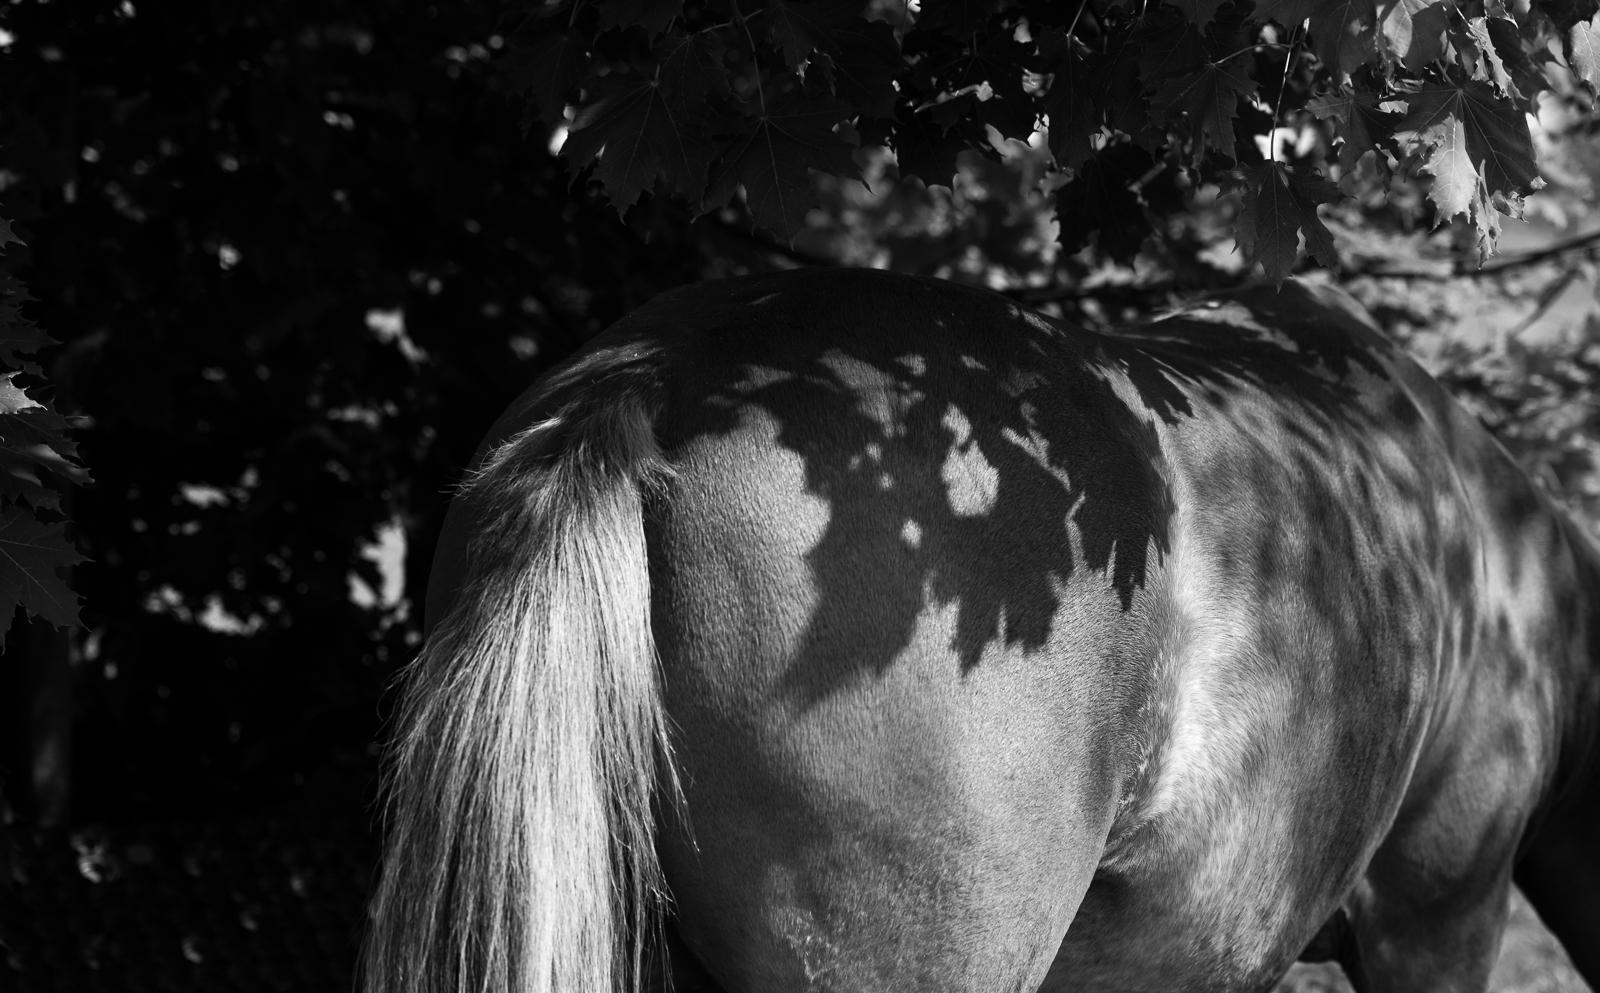 Schwarz weiß Foto | Blattmuster auf Pferdekruppe | dokumentarische Pferdefotografie | Sarah Koutnik Fotografie